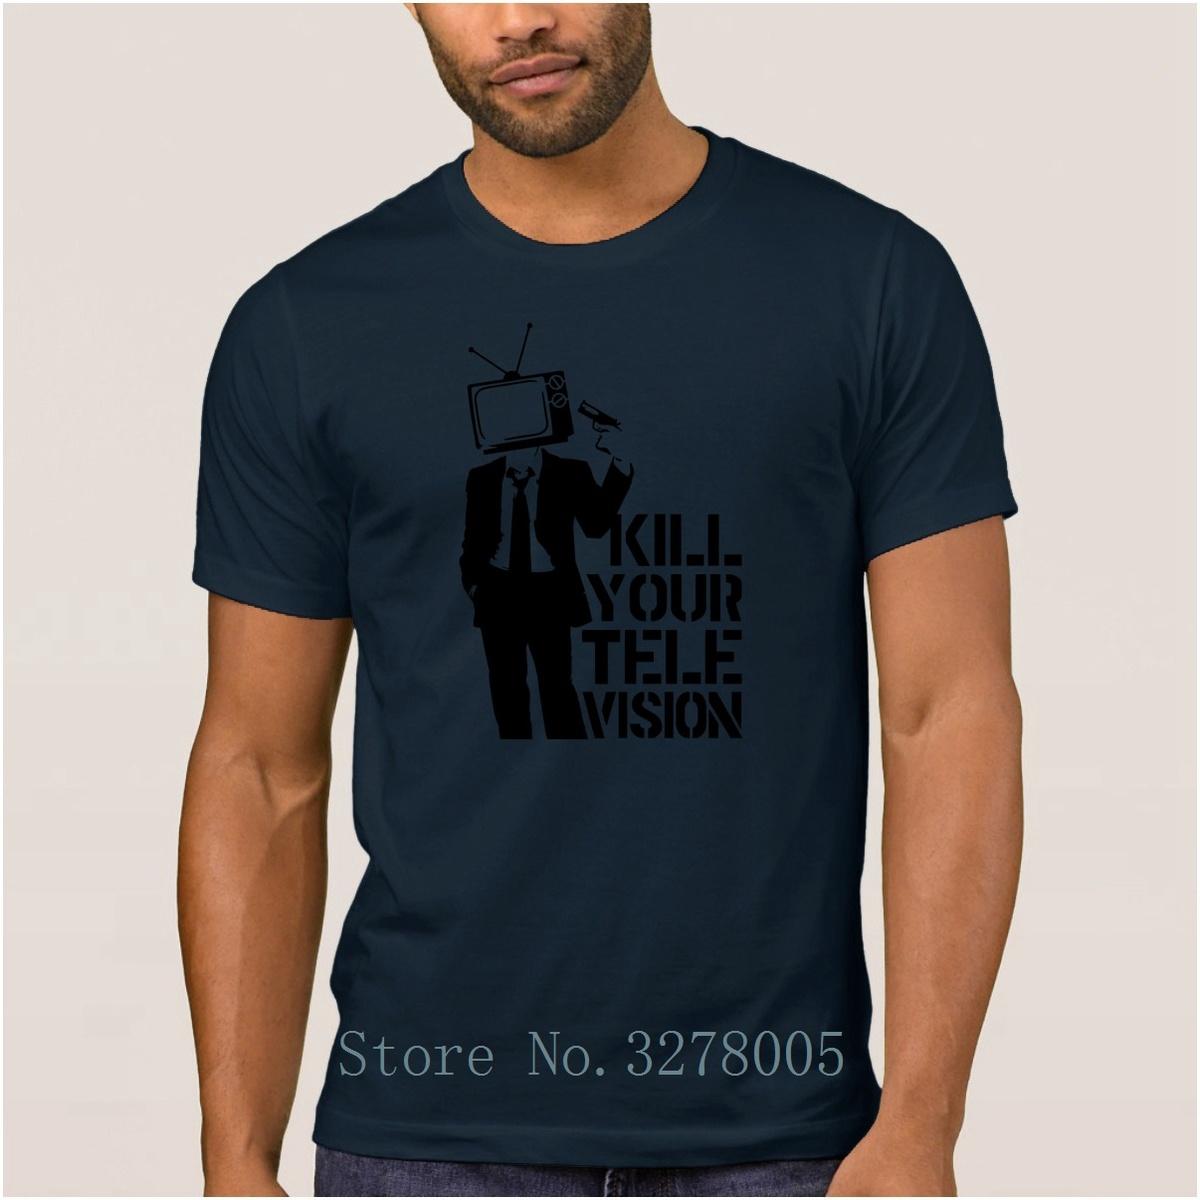 Brand La Maxpa Fitness Famous T Shirt Kill Your Television Vector Men T-Shirt 2018 Plus Size 3xl Gents Regular Tshirt For Men